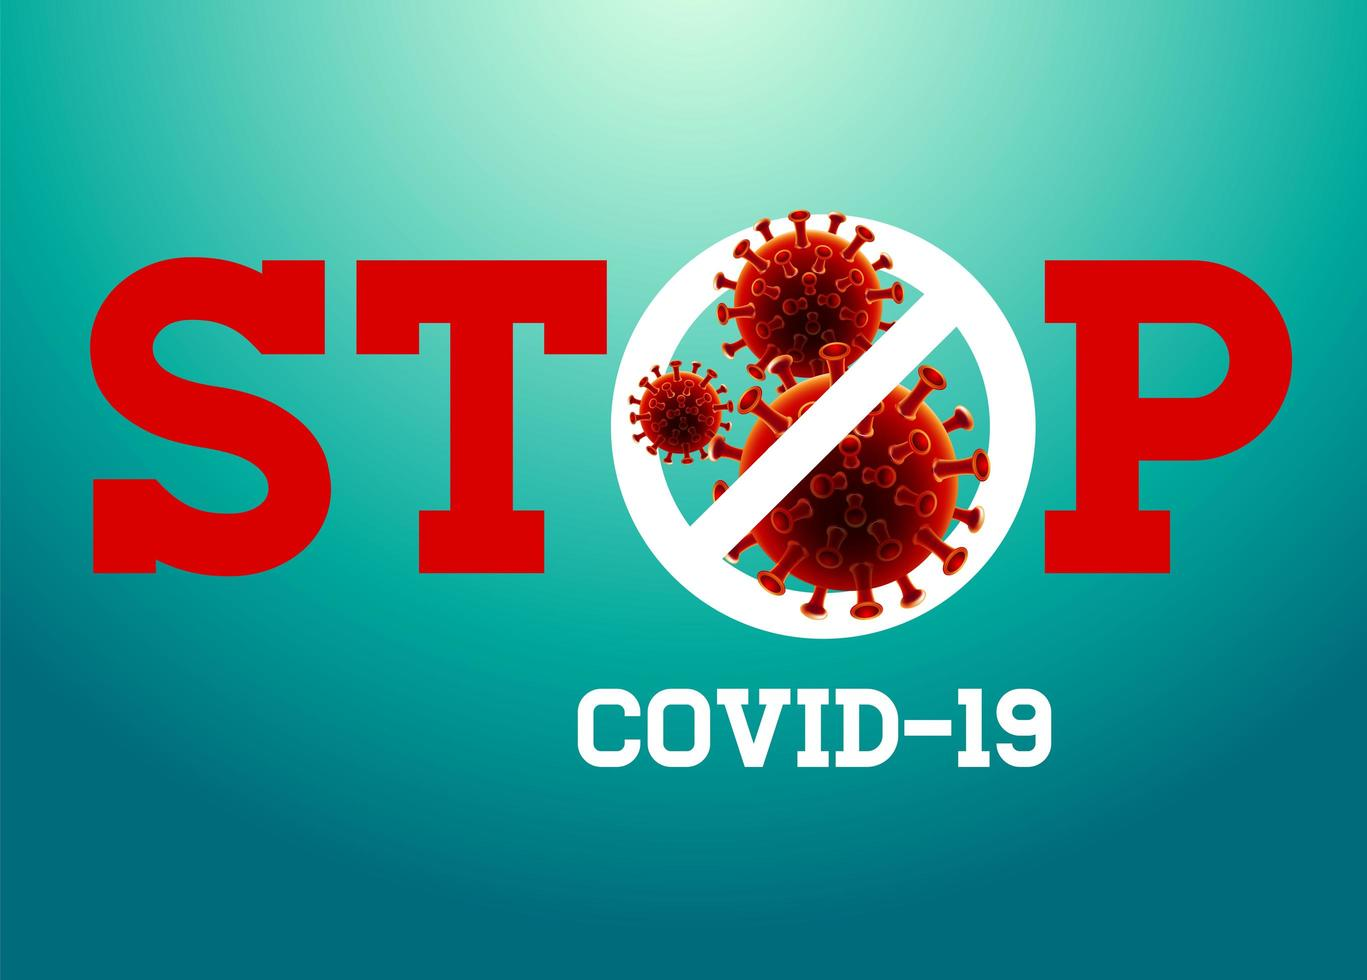 stop coronavirus covid-19 ontwerp vector